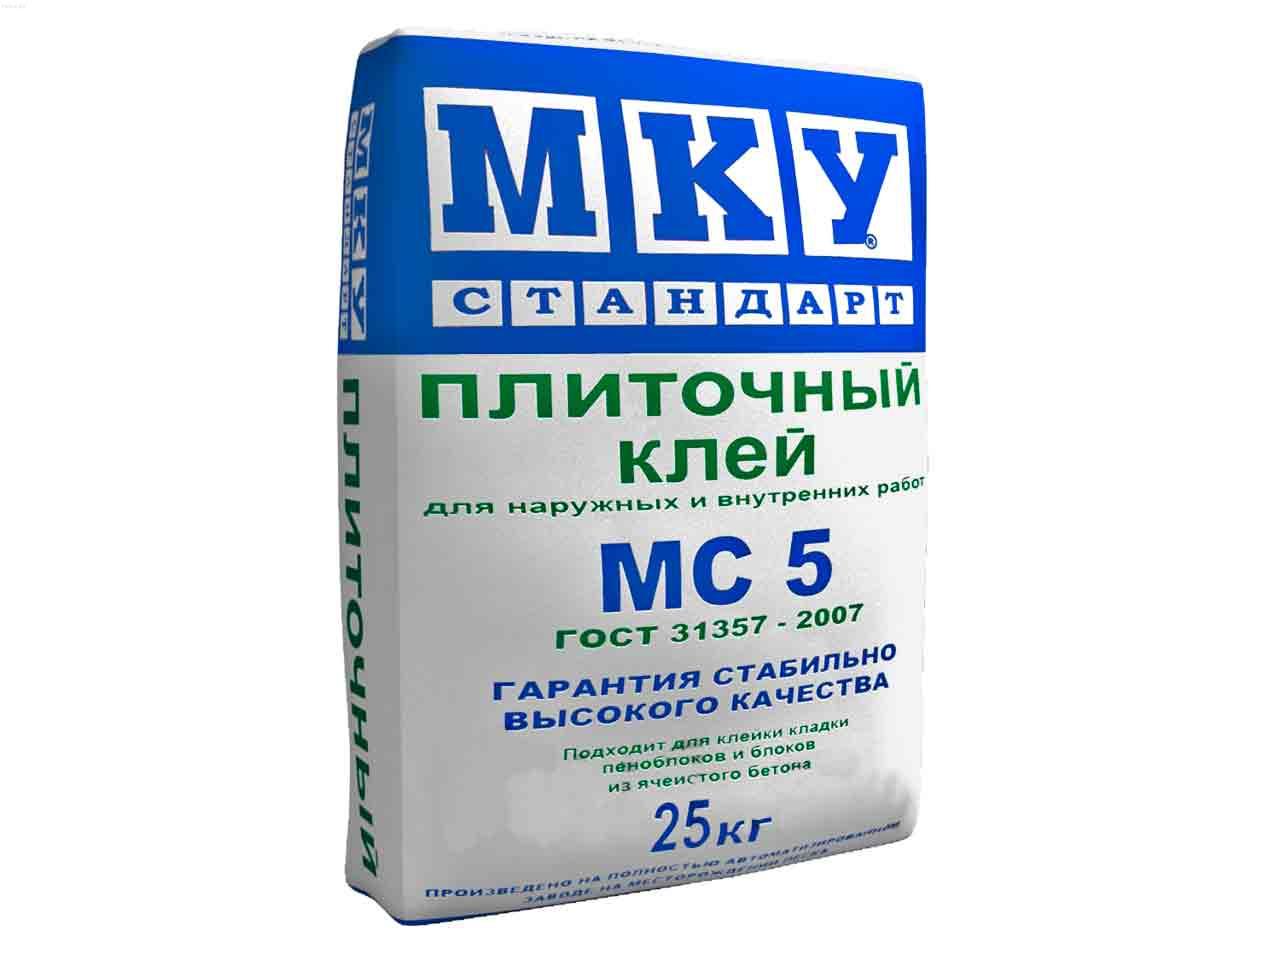 Клей МКУ Стандарт МС 5